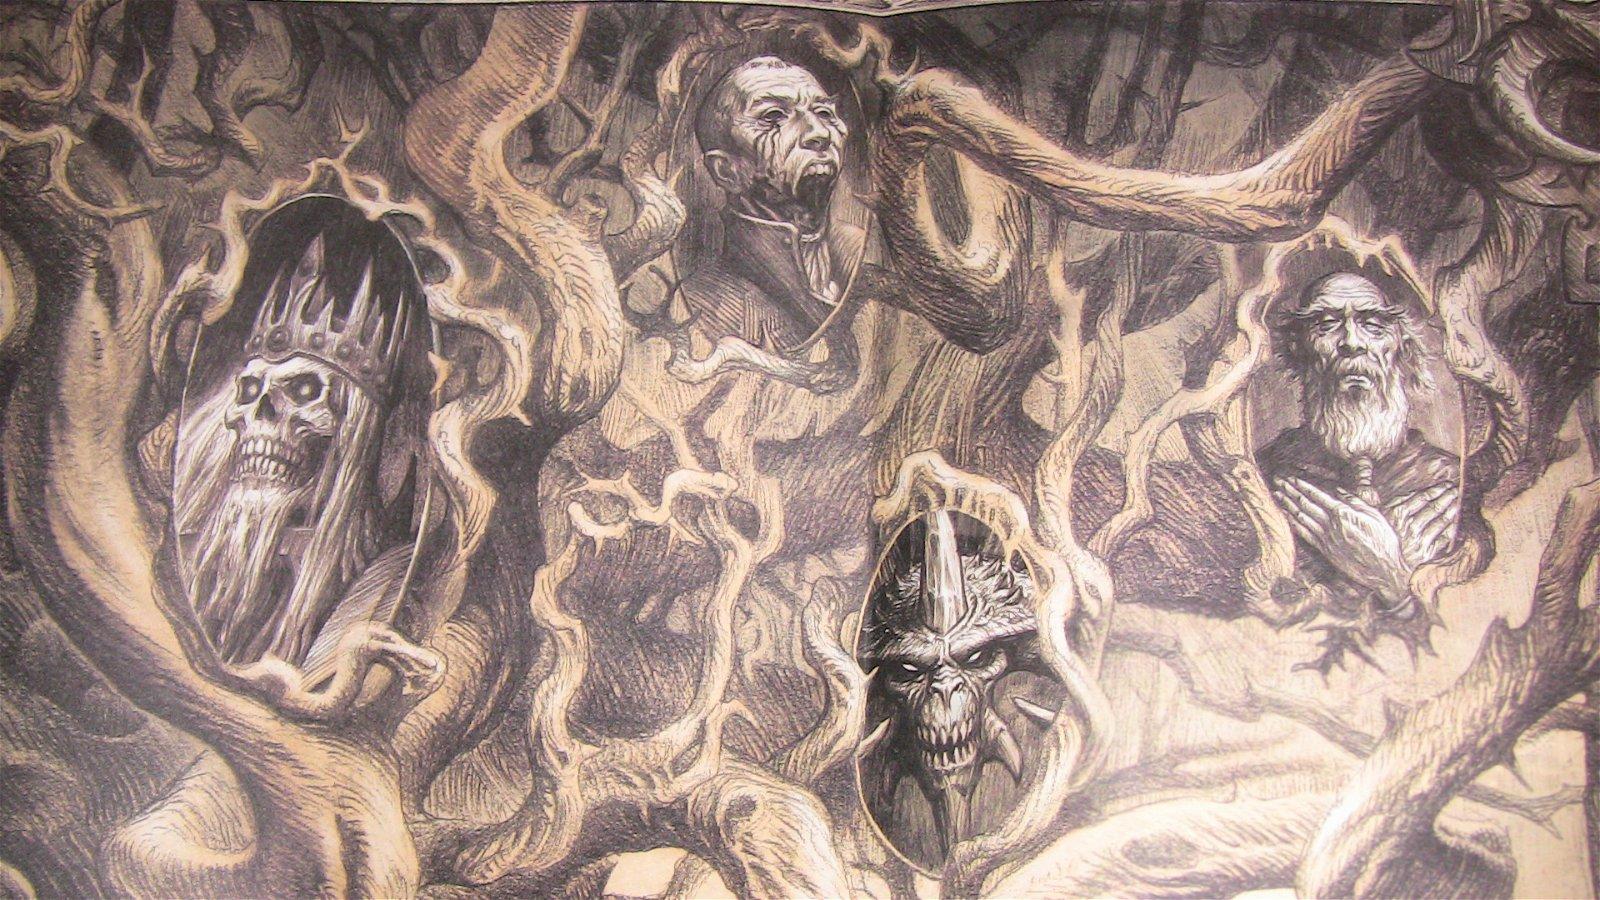 Diablo III: Book of Tyrael (Book) Review 3